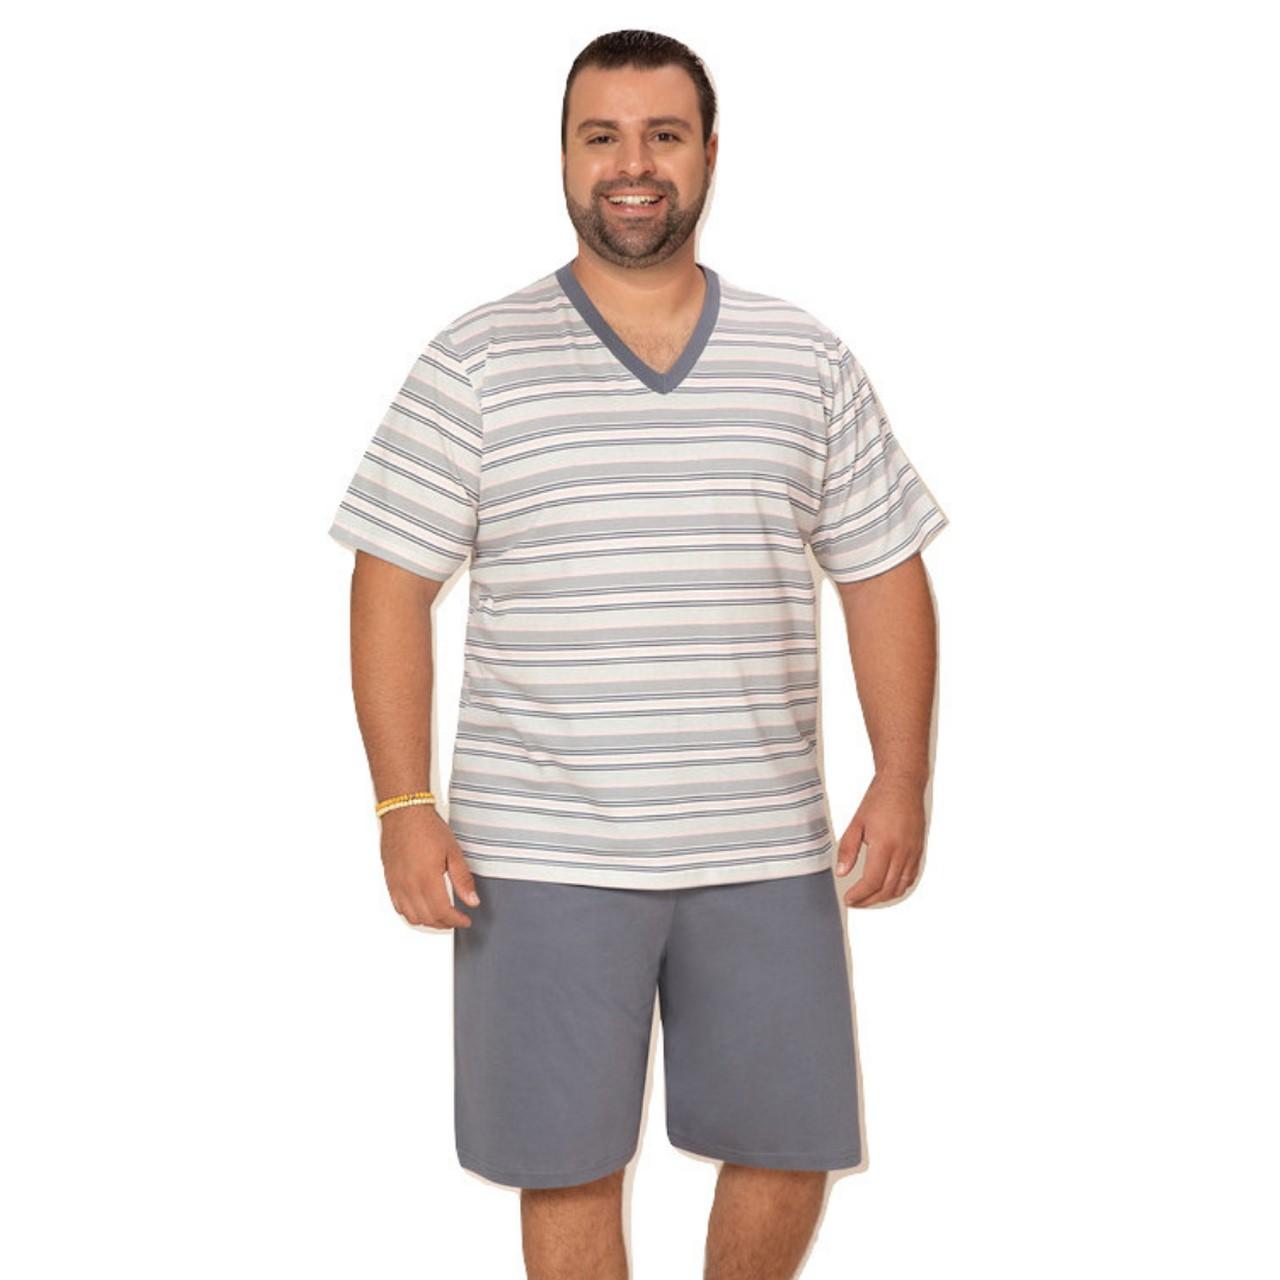 Pijama curto p/ homem verão plus size blusa listrada bermuda